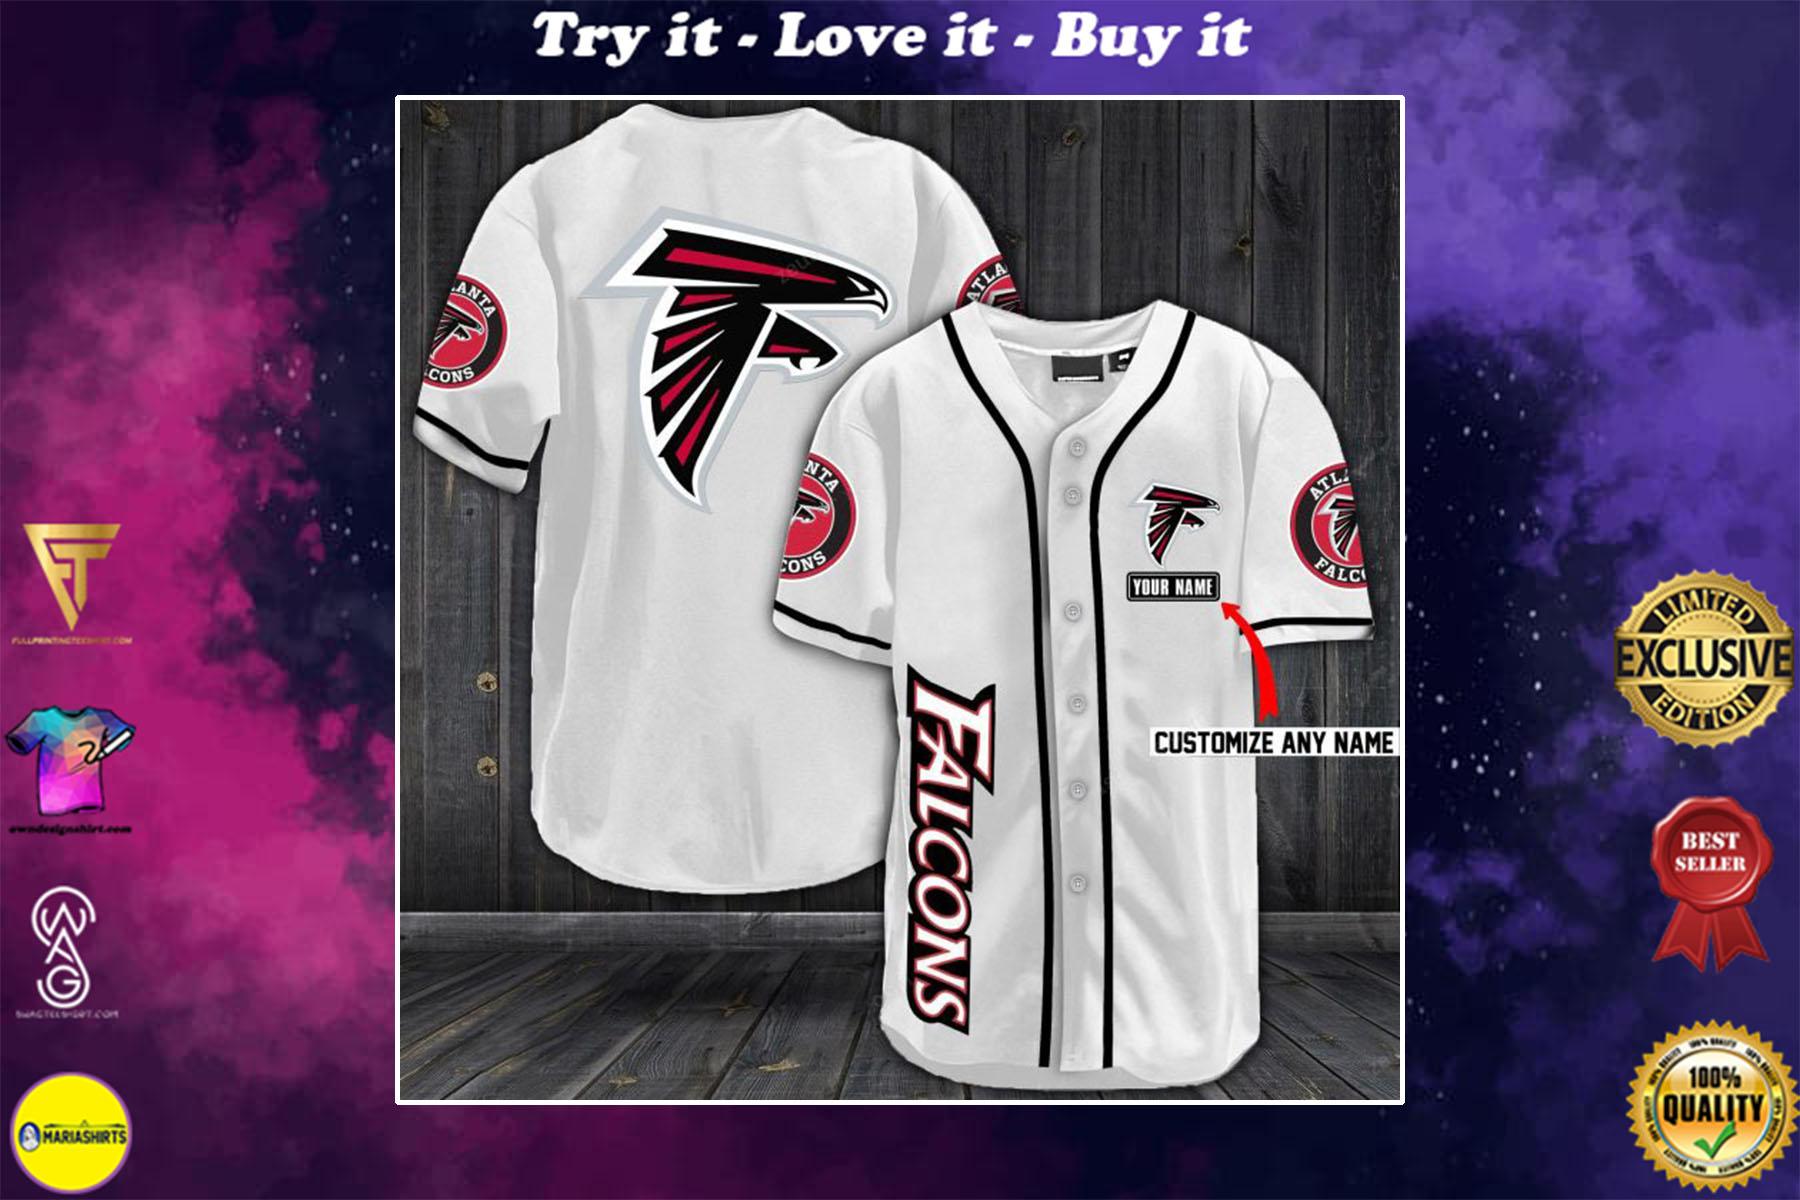 [special edition] personalized name jersey atlanta falcons full printing shirt - maria